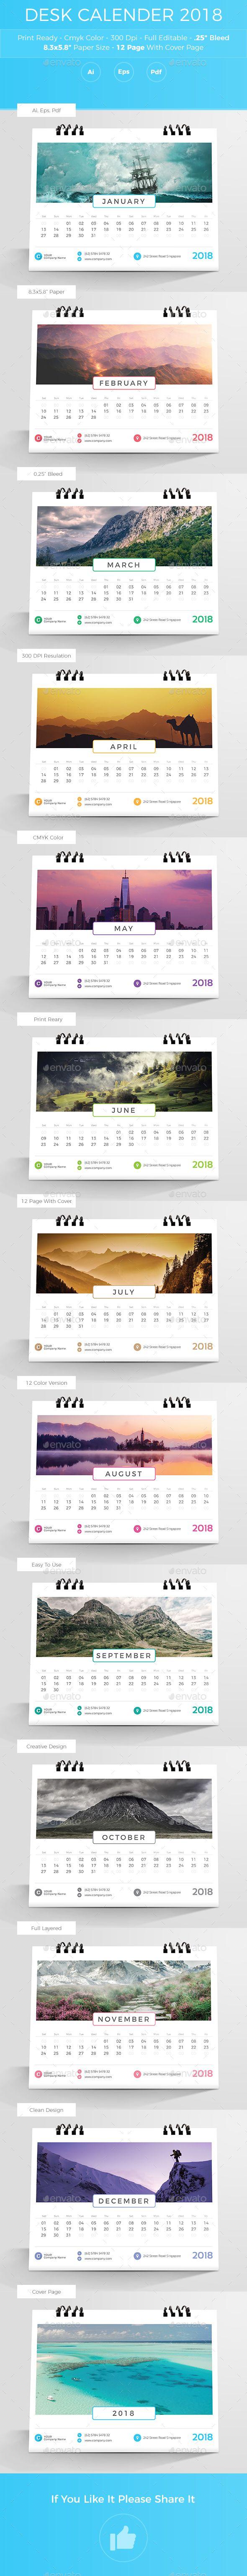 Desk Calender 2018 - #Calendars #Stationery